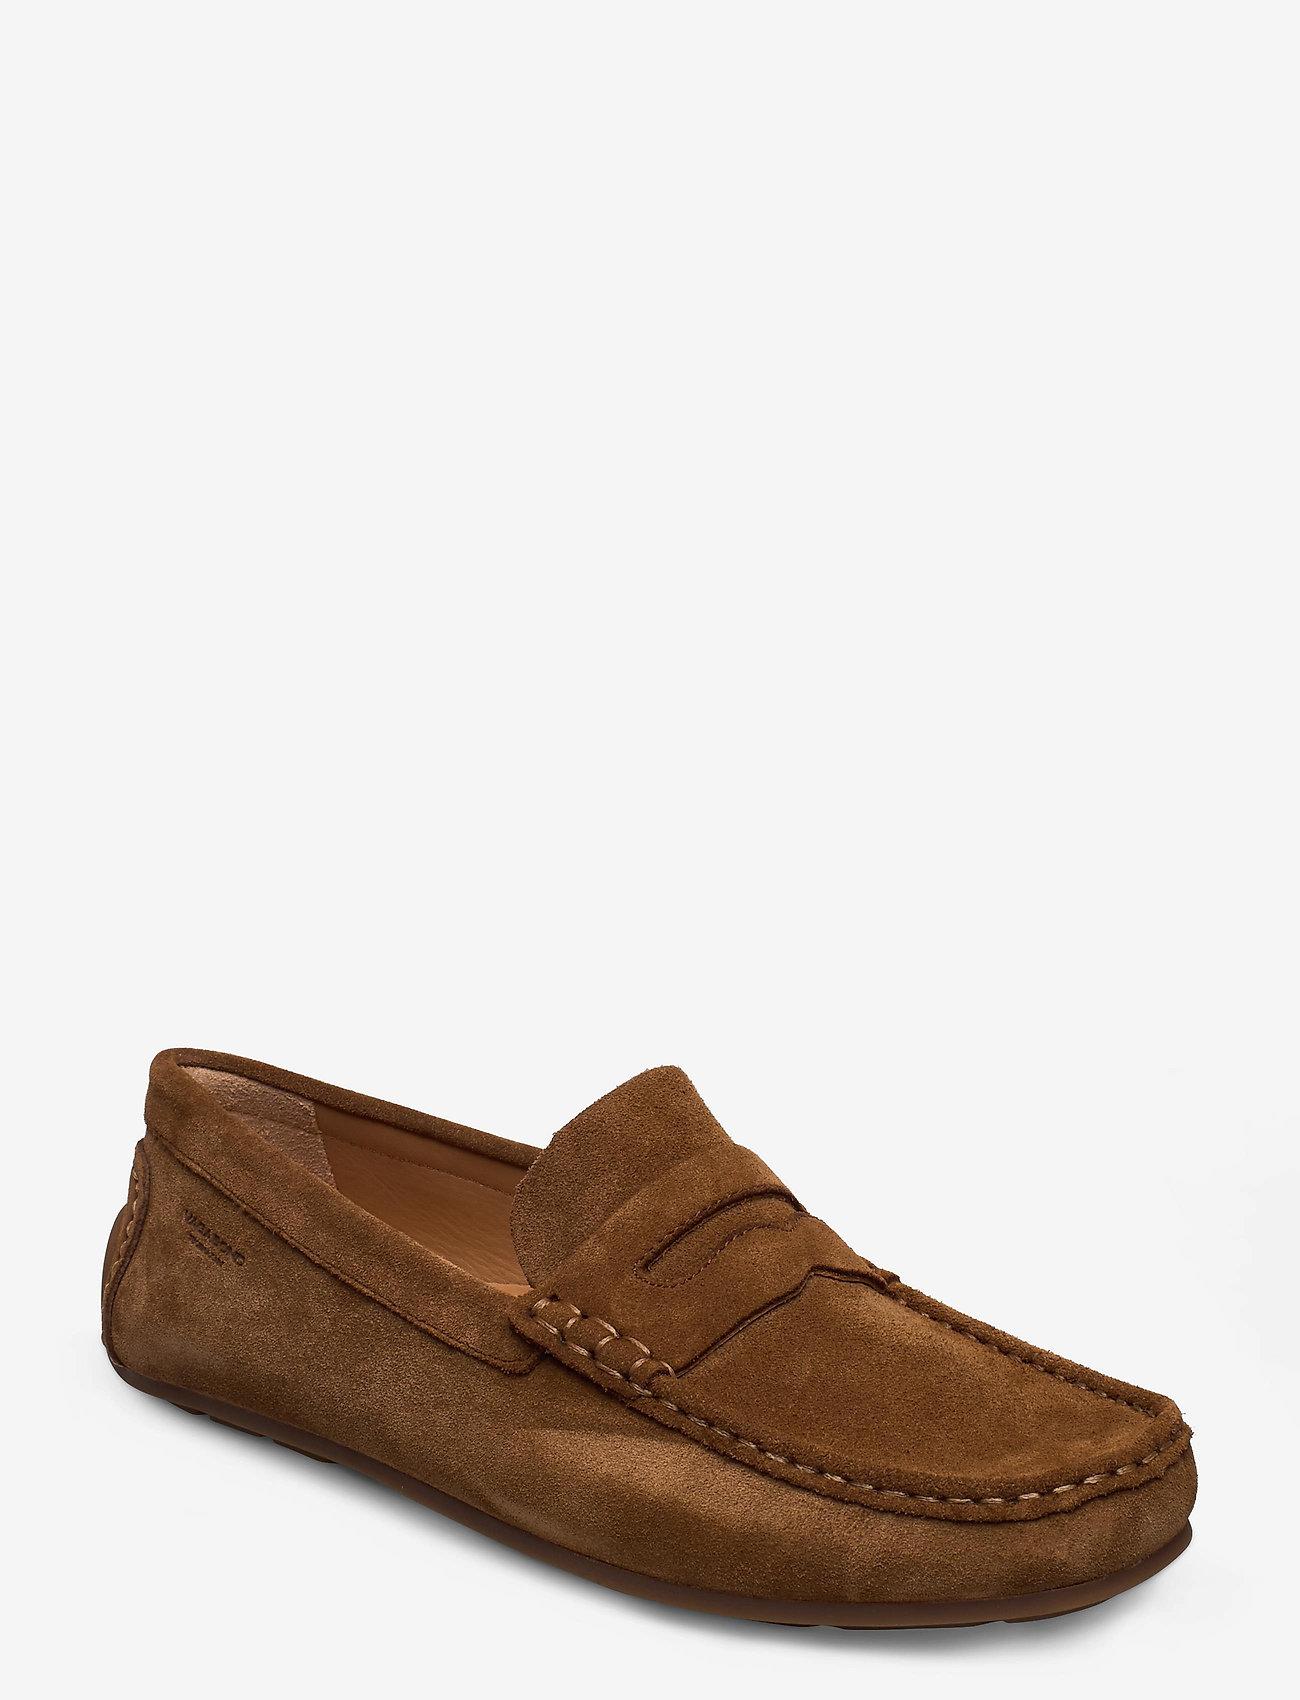 VAGABOND - WAYNE - loafers - cognac - 0